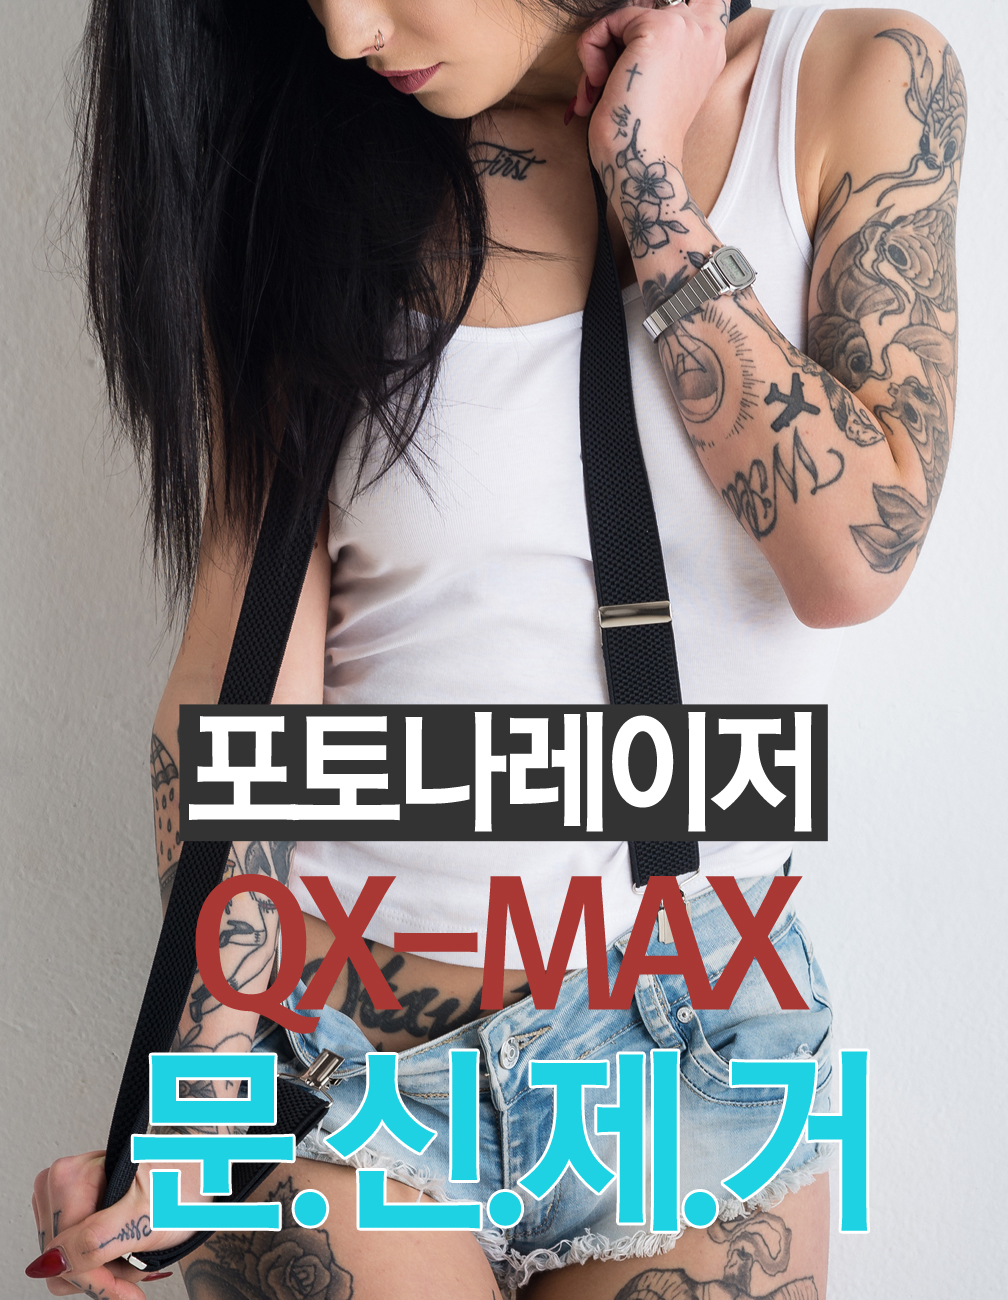 lisent qx-max p2.jpg